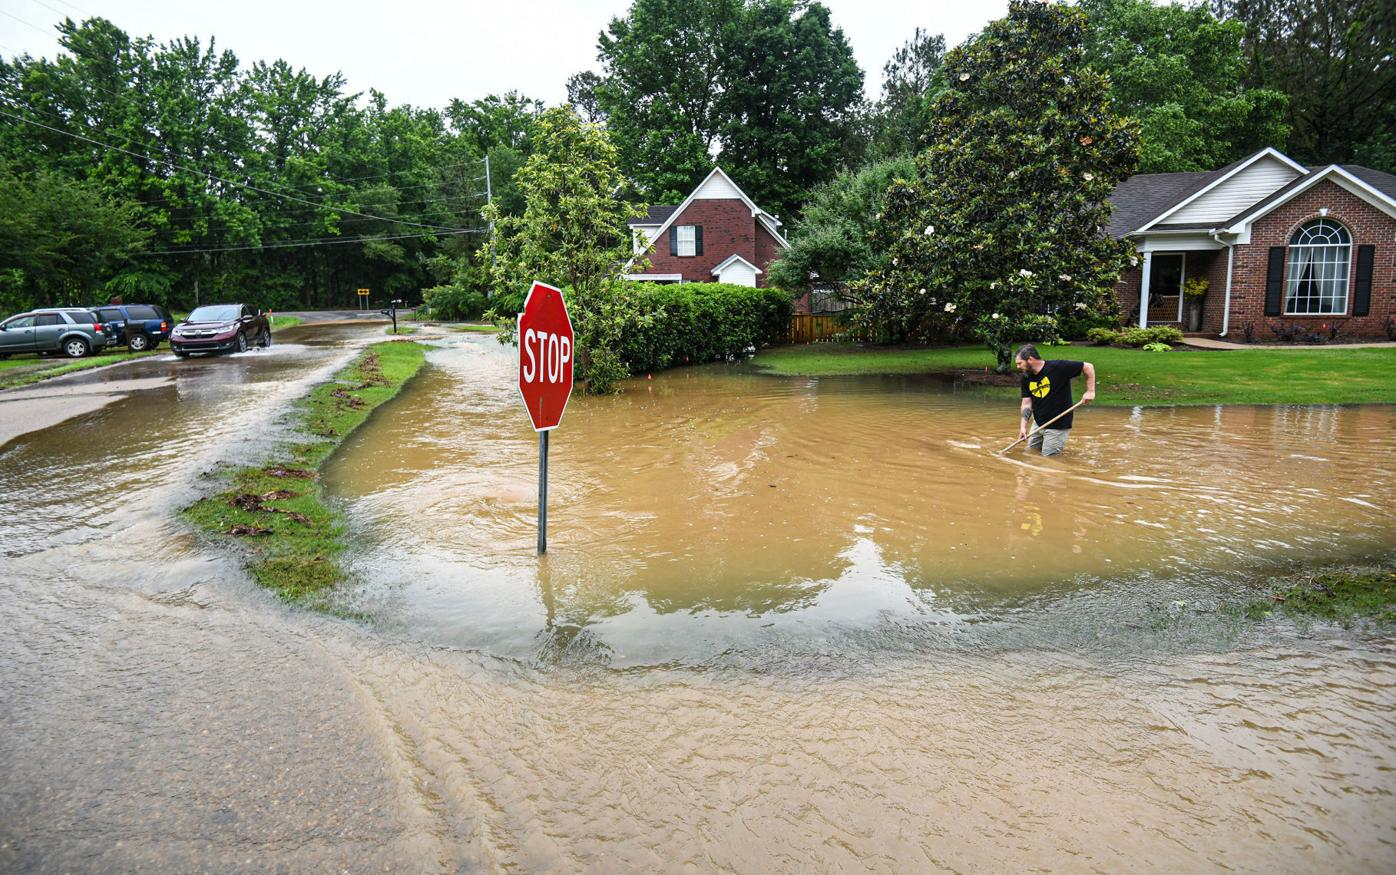 djr-2021-06-10-news-oxford-flooding-bnp4